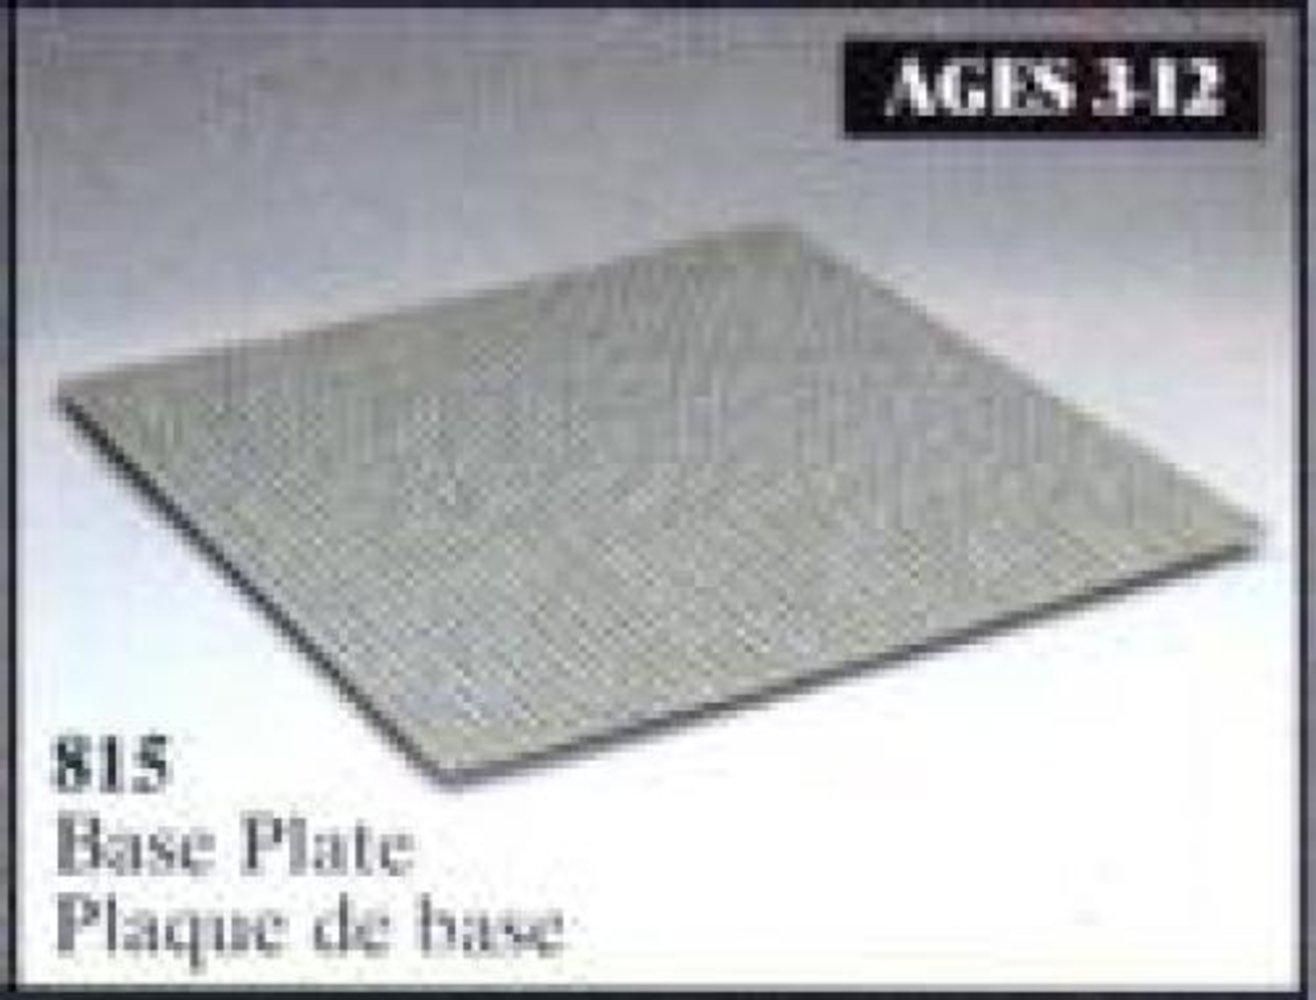 Baseplate, Gray